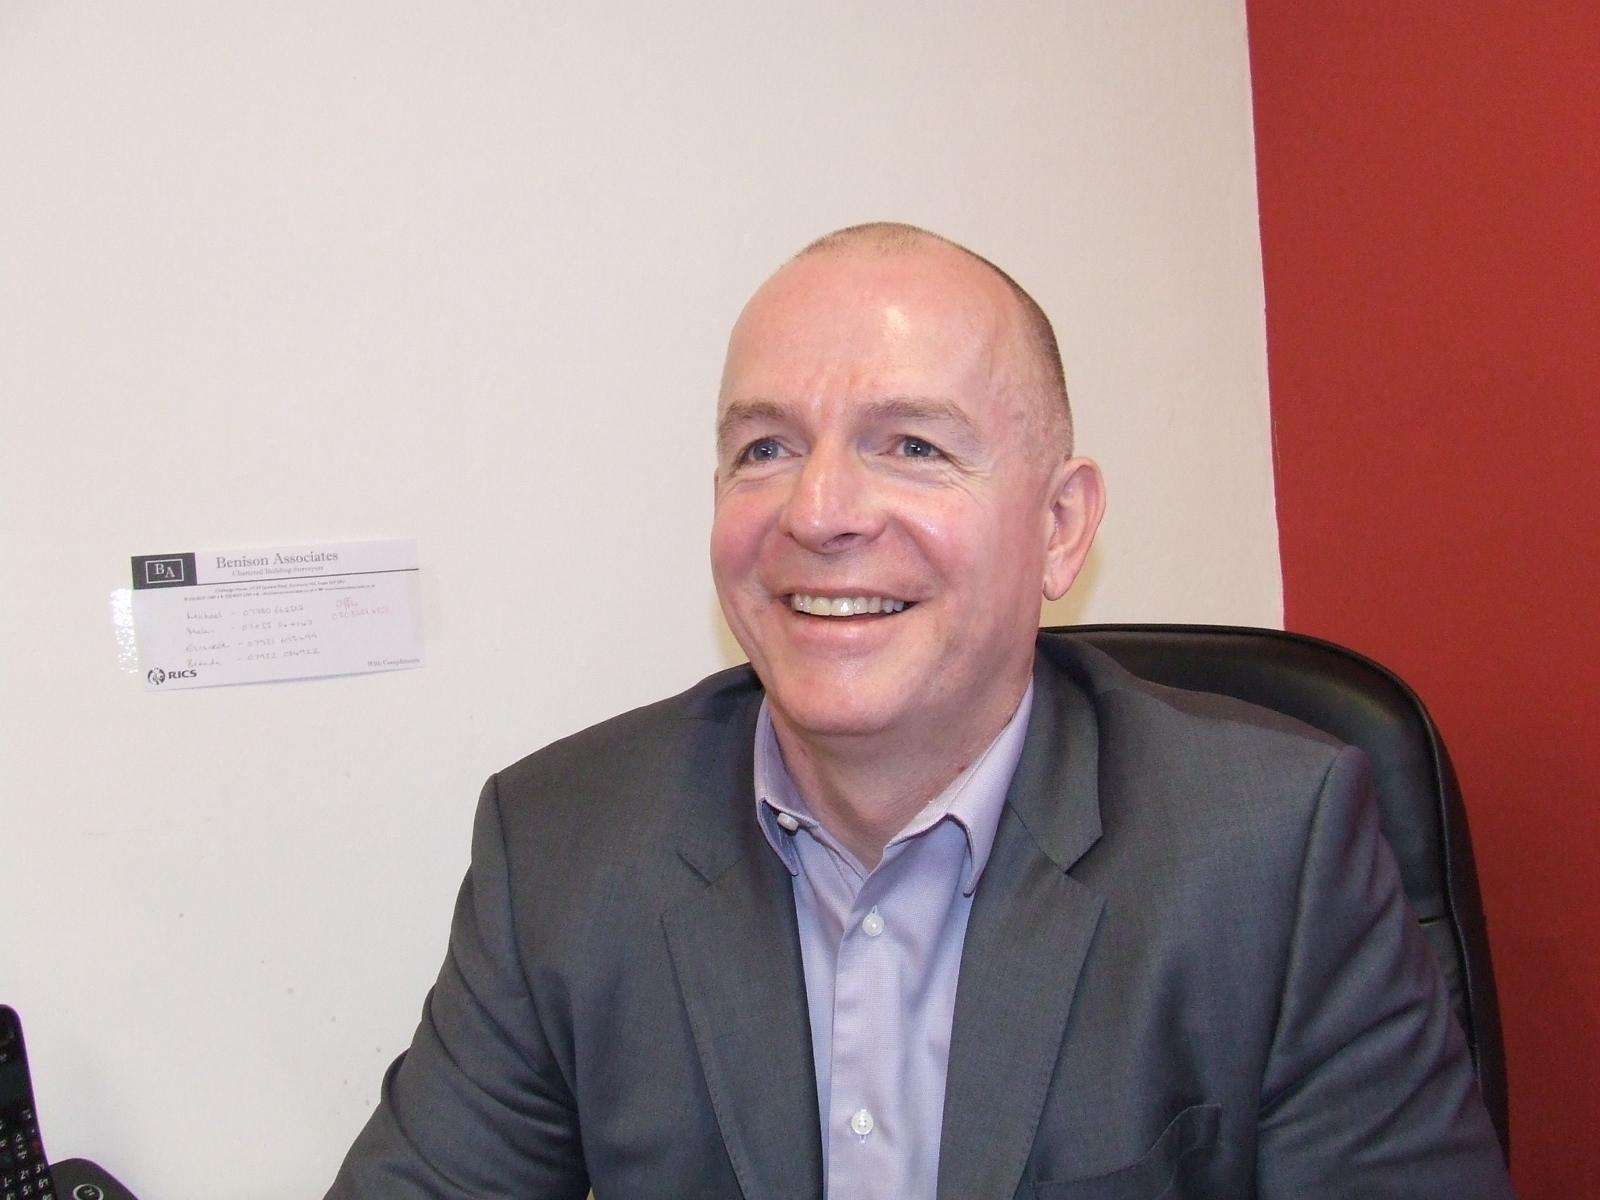 Michael Conway BSc (Hons) MRICS